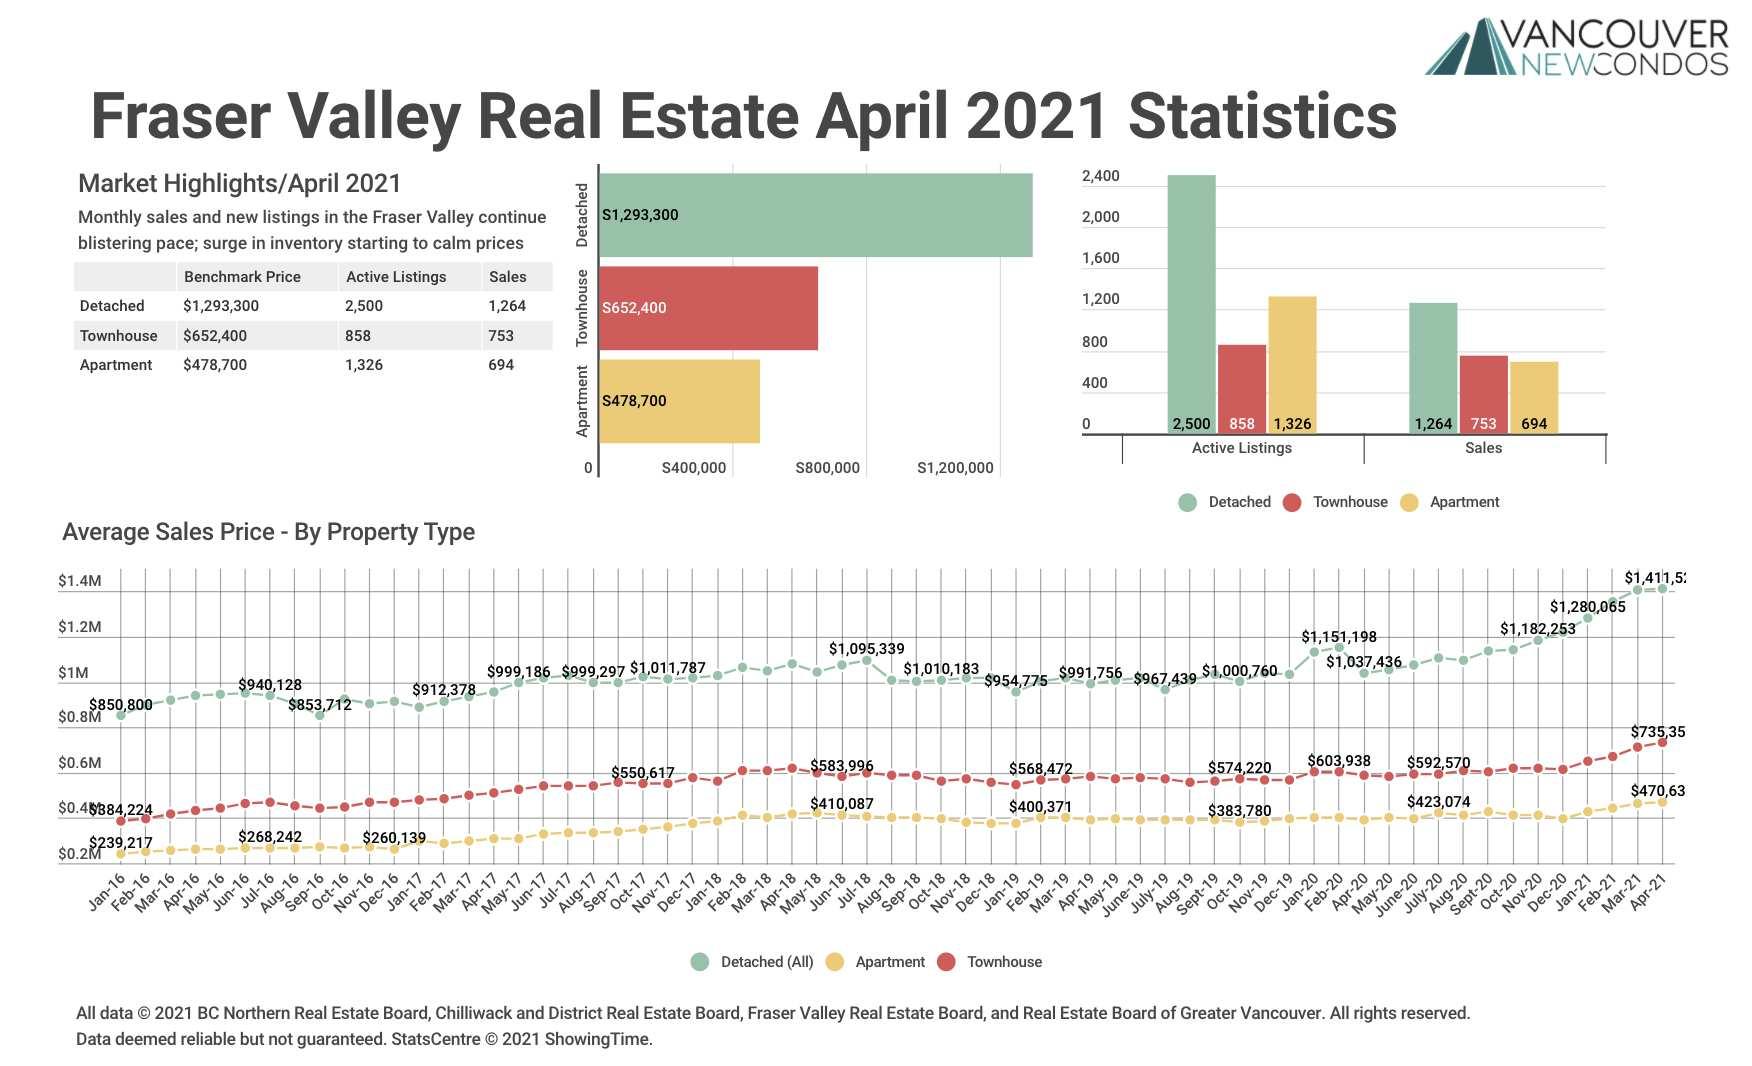 FVREB Apr 21 stats graph